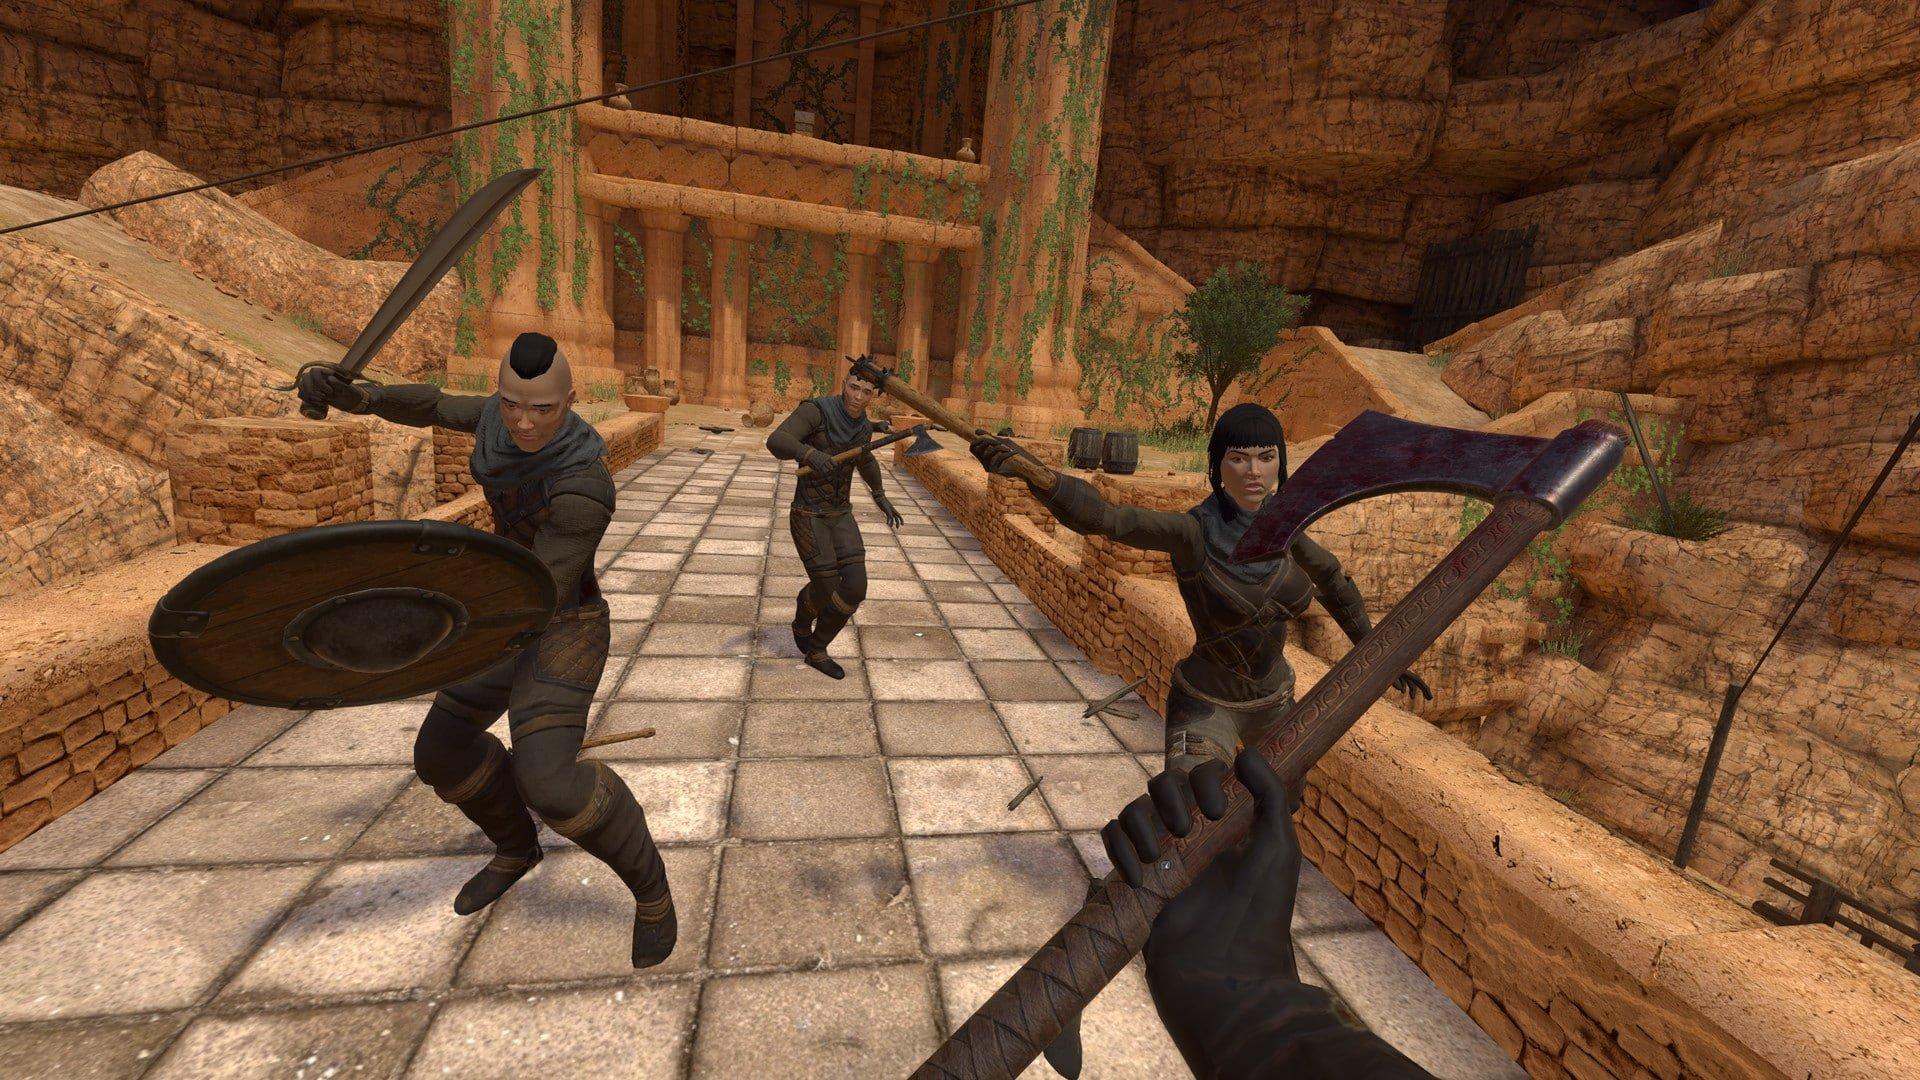 Martial combat on a bridge in Blade & Sorcery